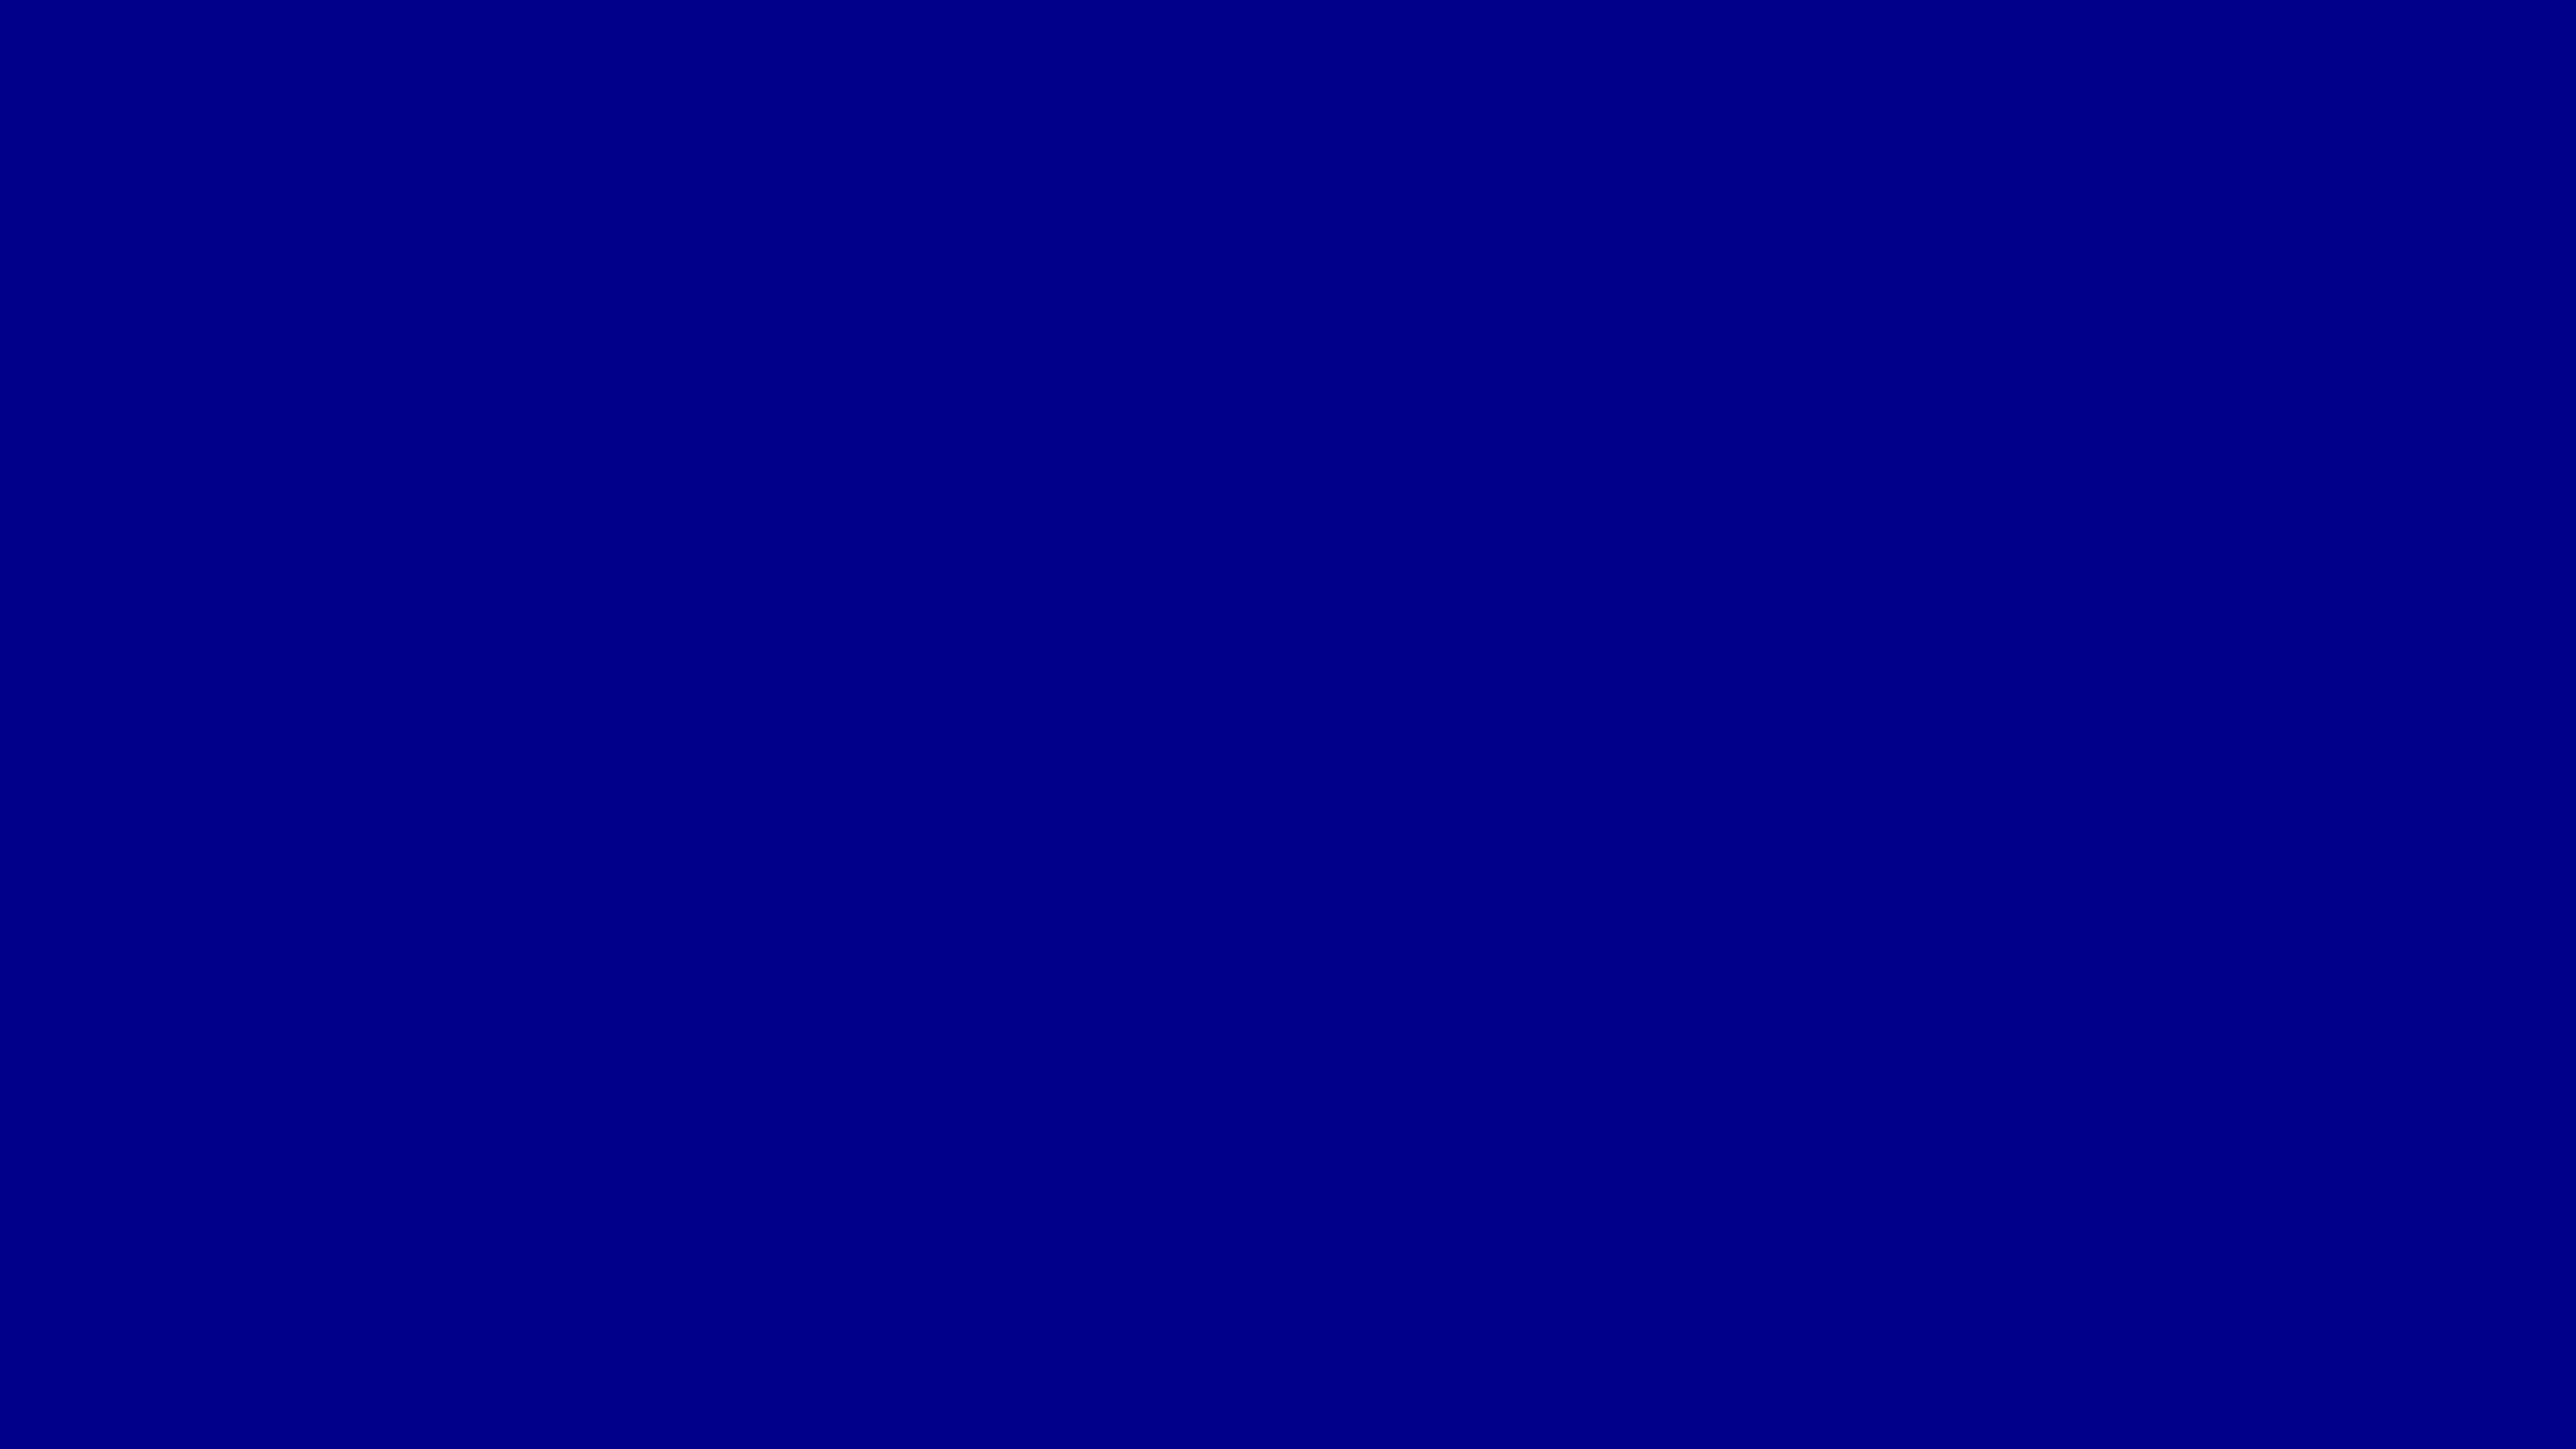 5120x2880 Dark Blue Solid Color Background